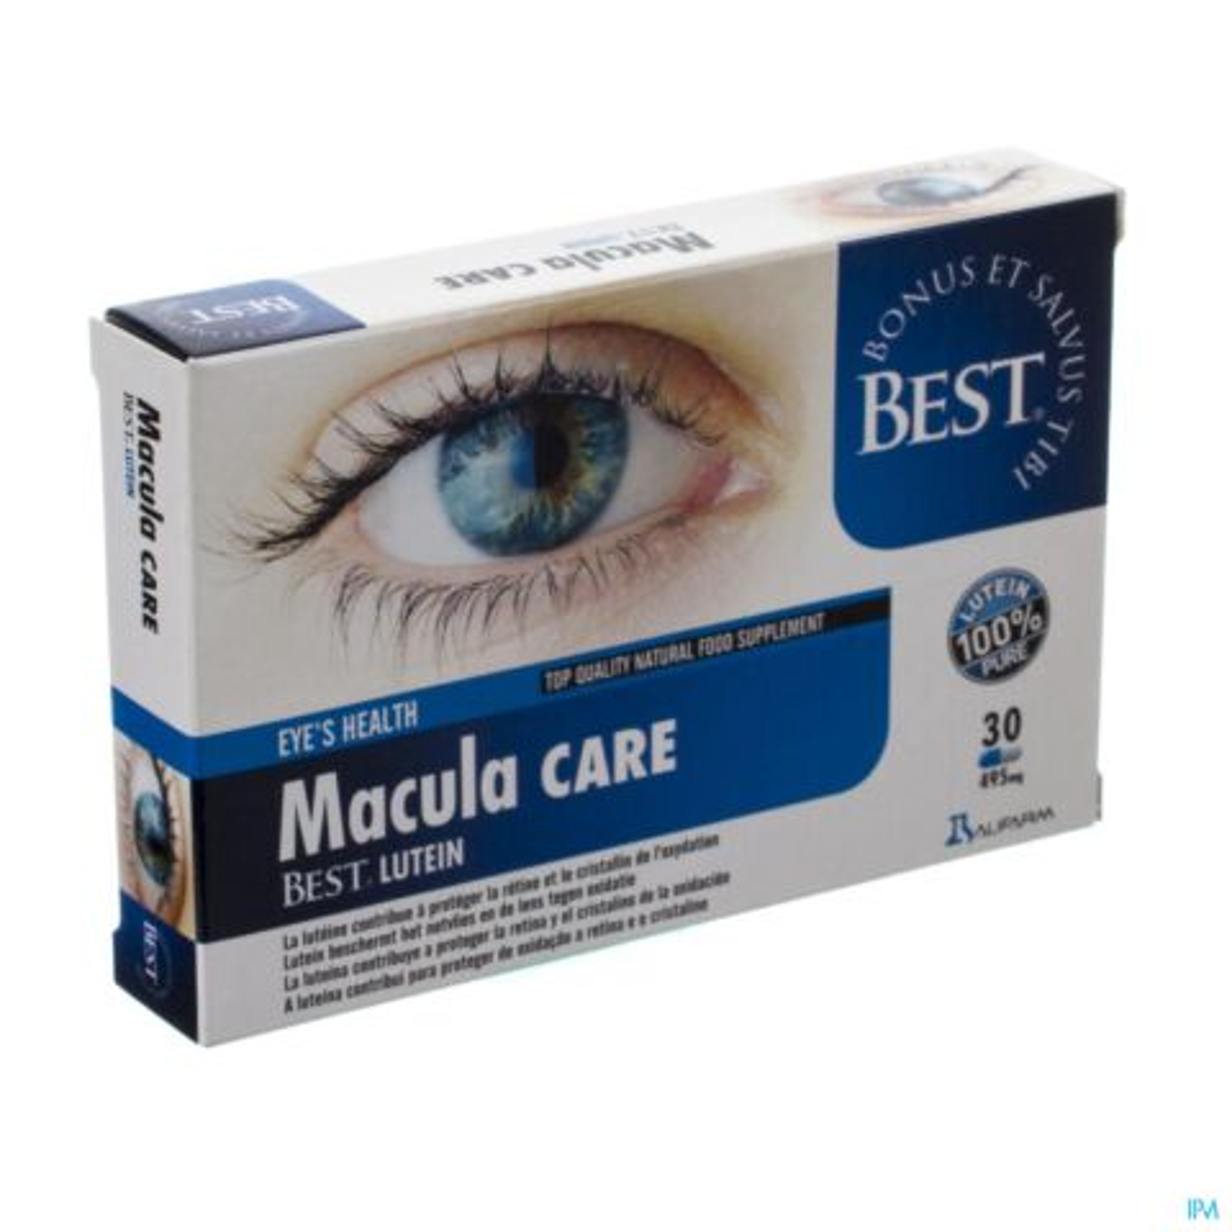 MACULA CARE (BEST) BLISTER GEL 30